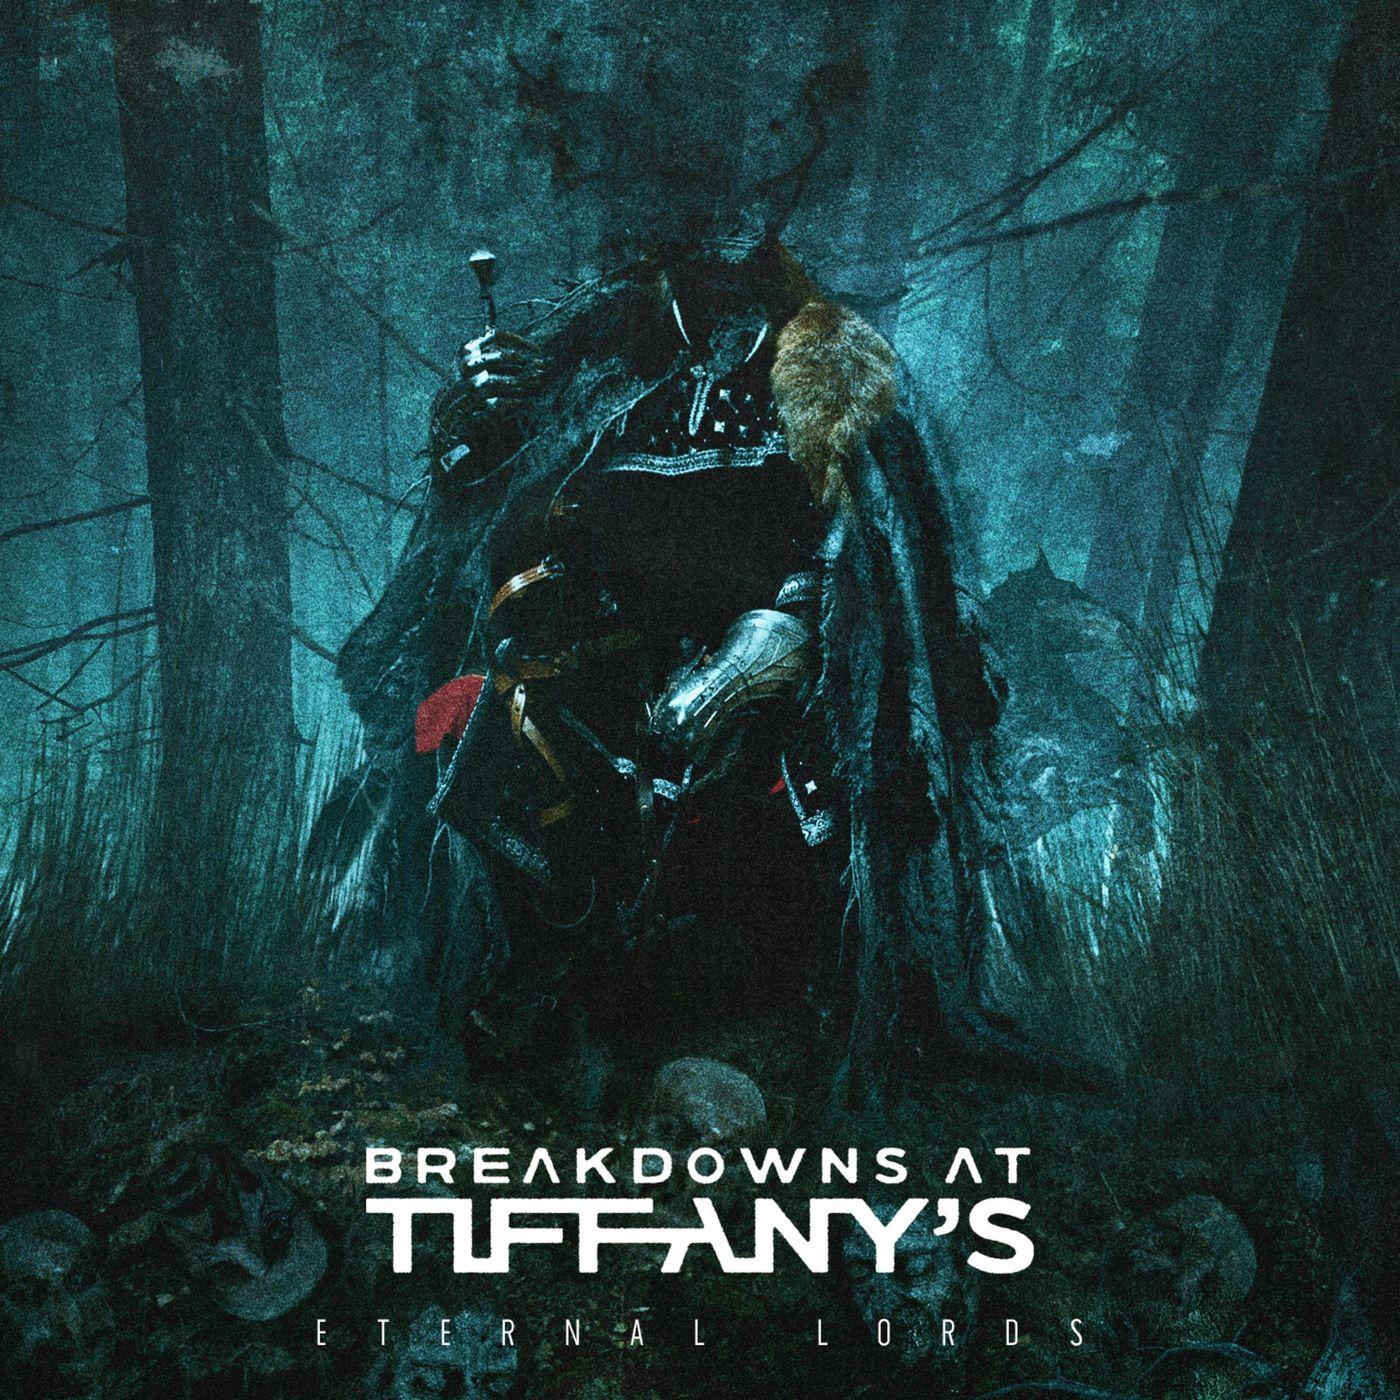 Breakdowns At Tiffany's - Messenger [single] (2020)